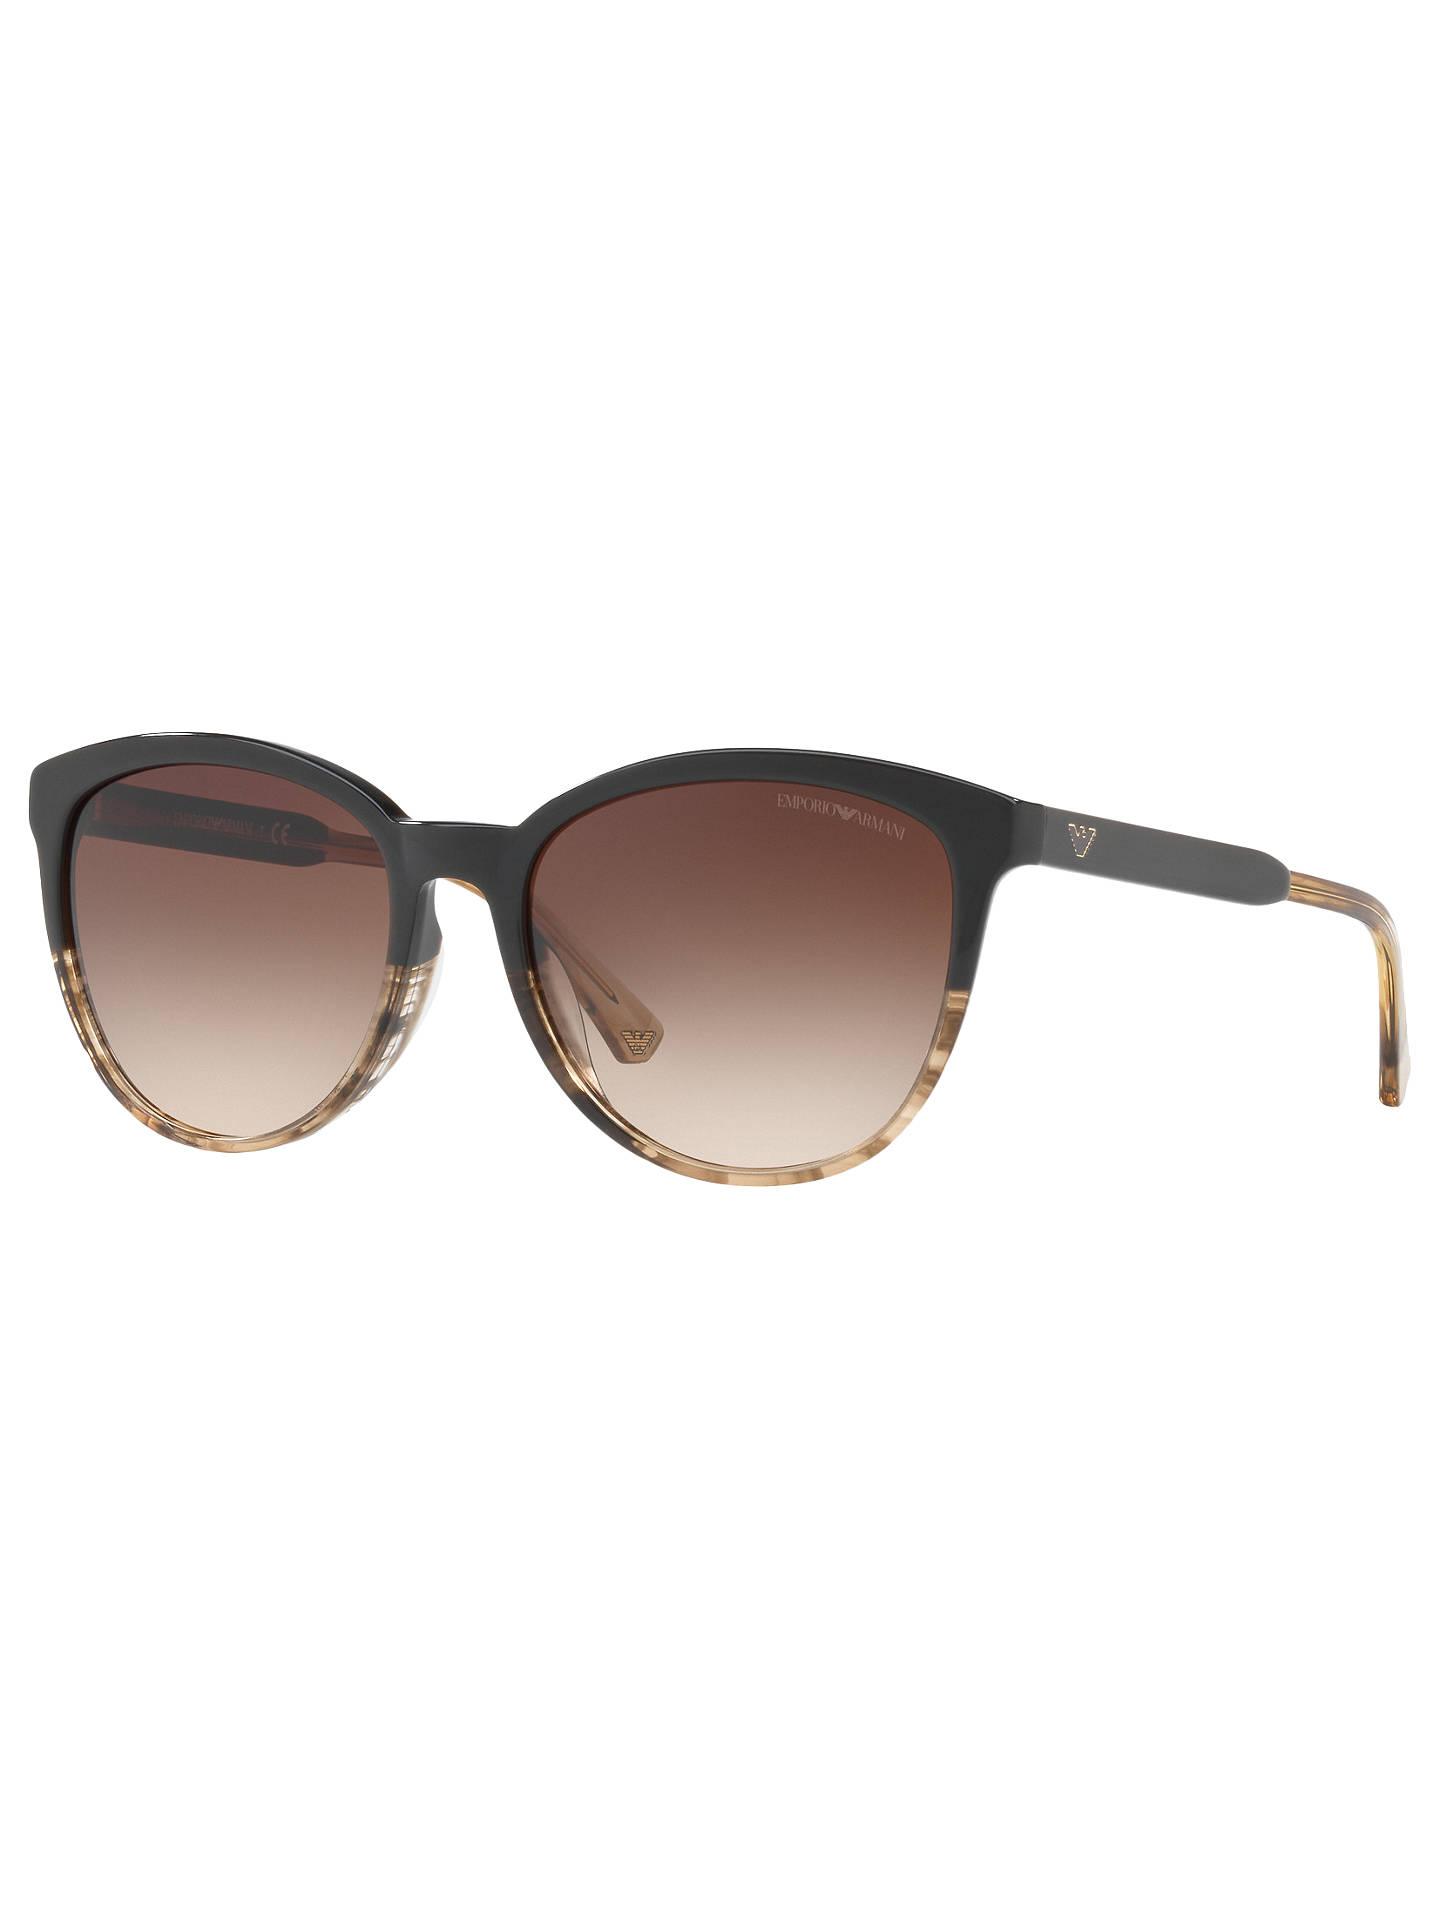 488b1285f26 Buy Emporio Armani EA4101 Cat s Eye Sunglasses